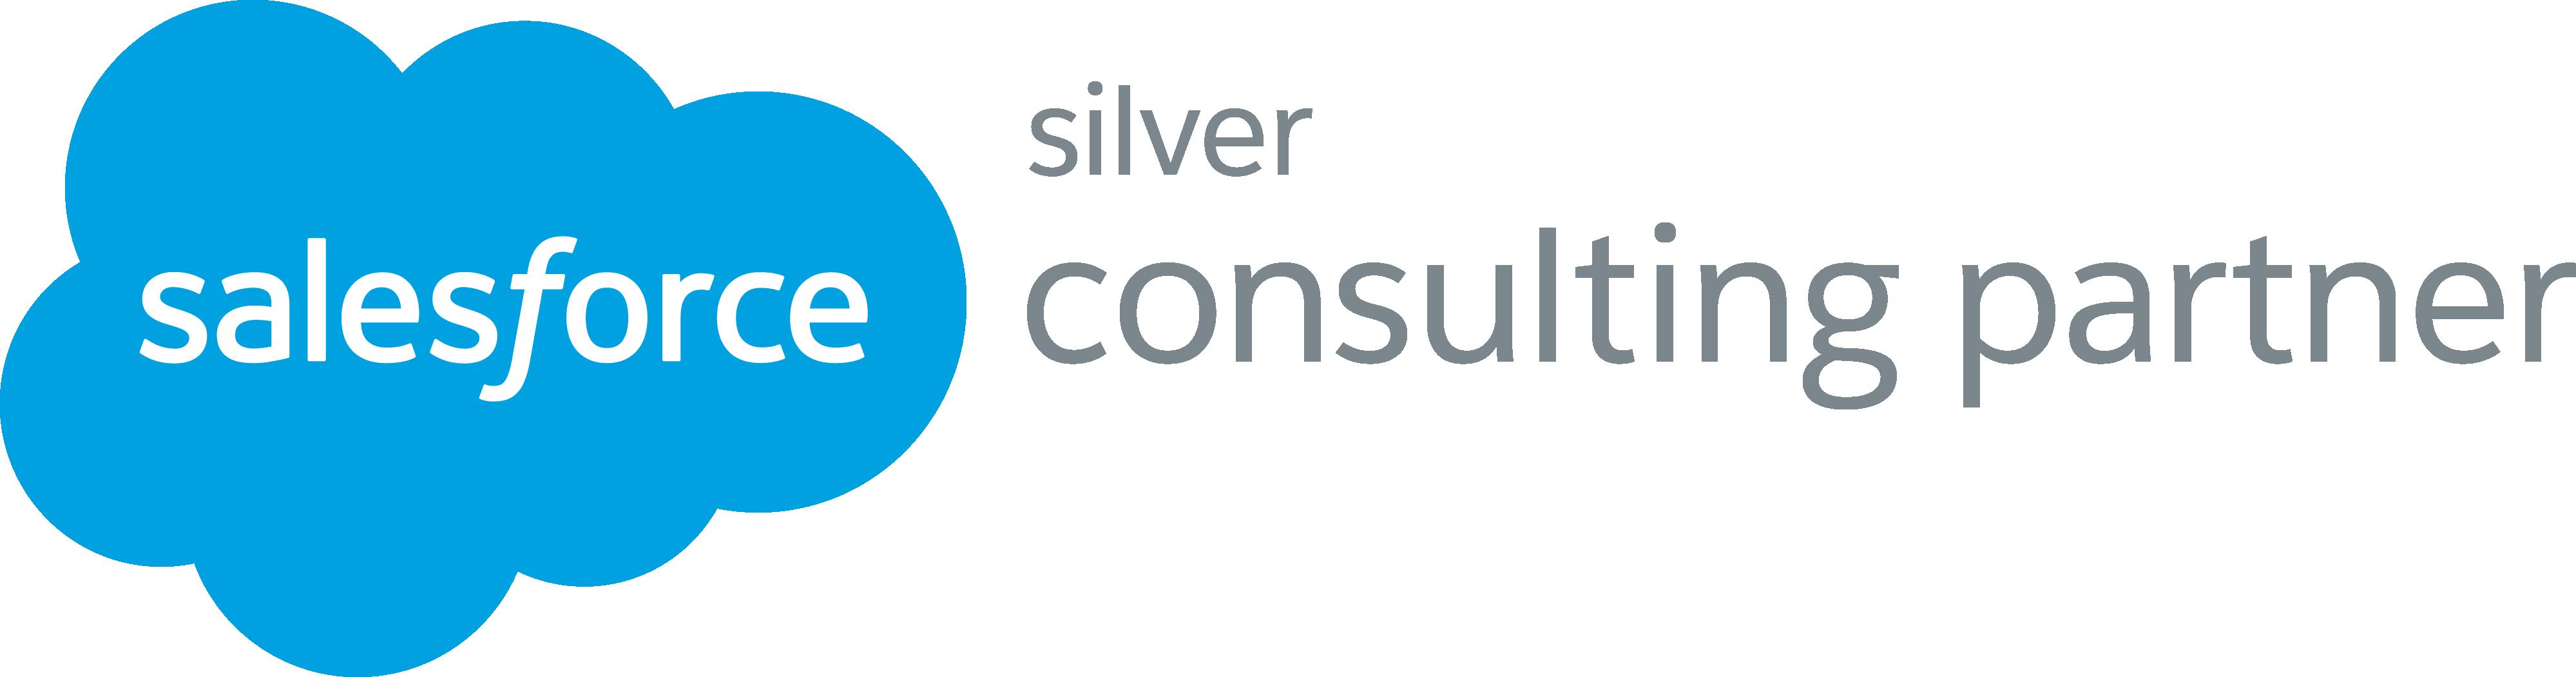 2015sf_Partner_SilverConsultingPartner_logo_RGB (1)